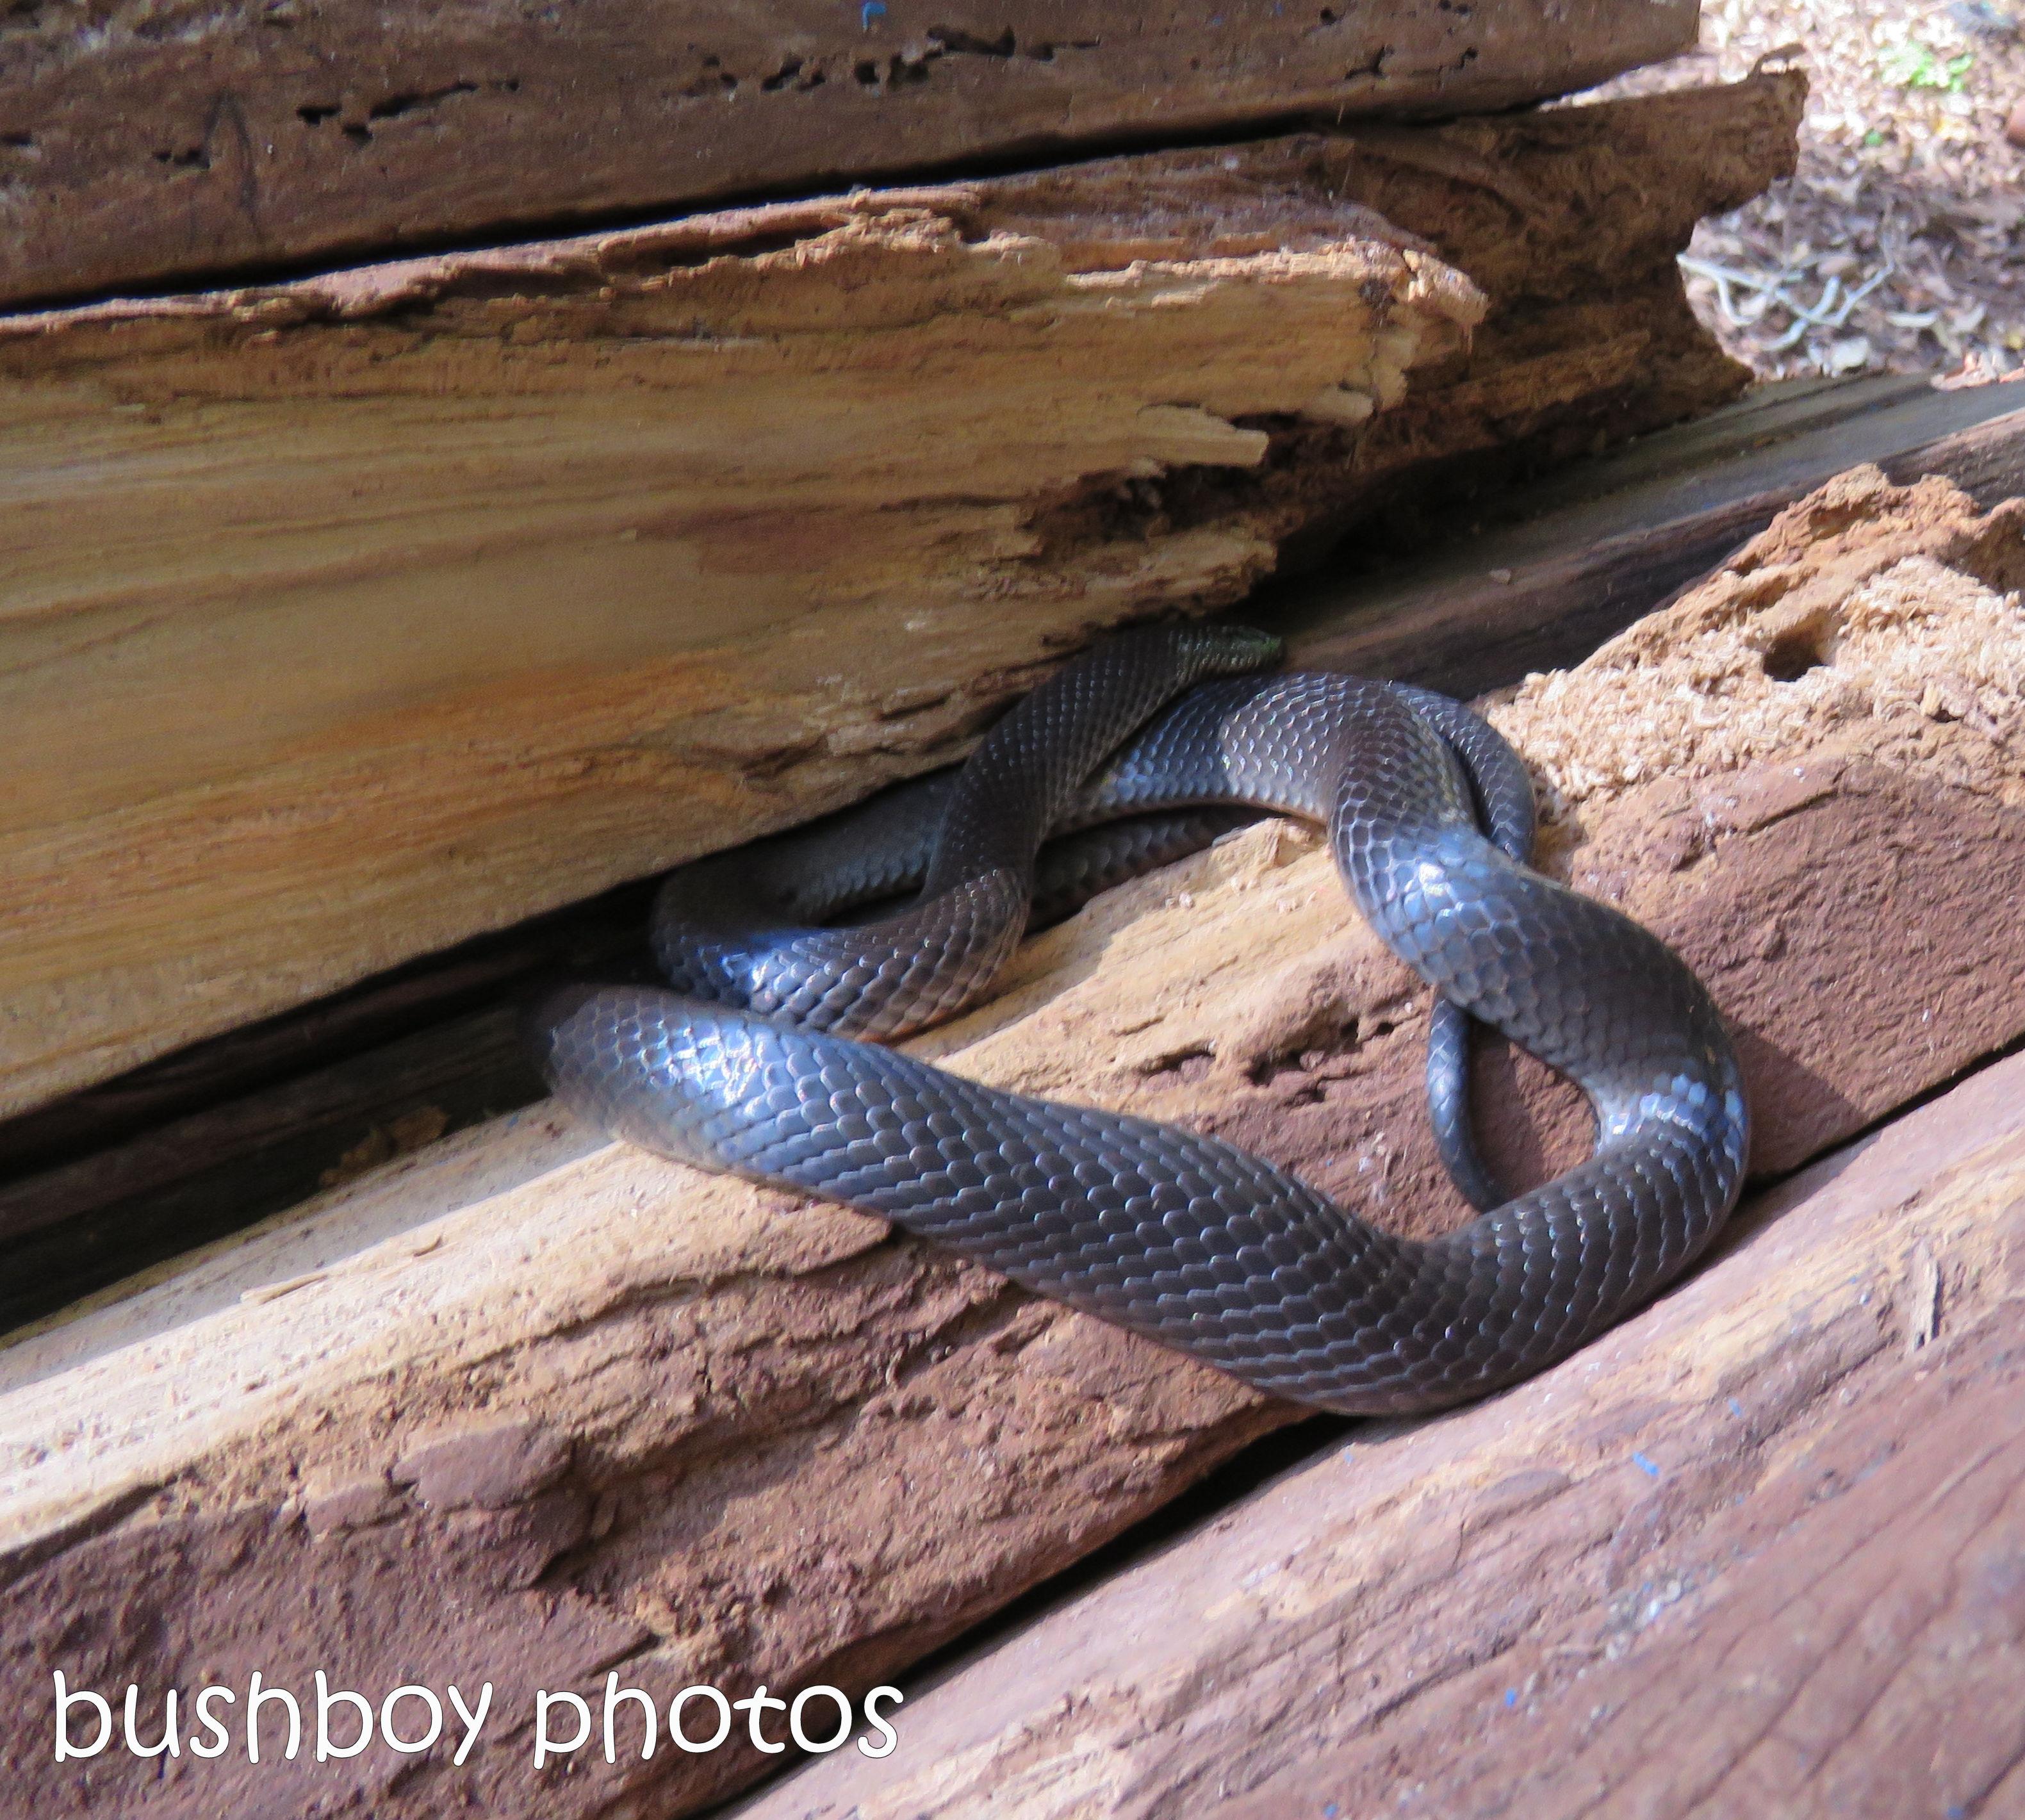 black snake_wood pile_named_binna burra_june 2017